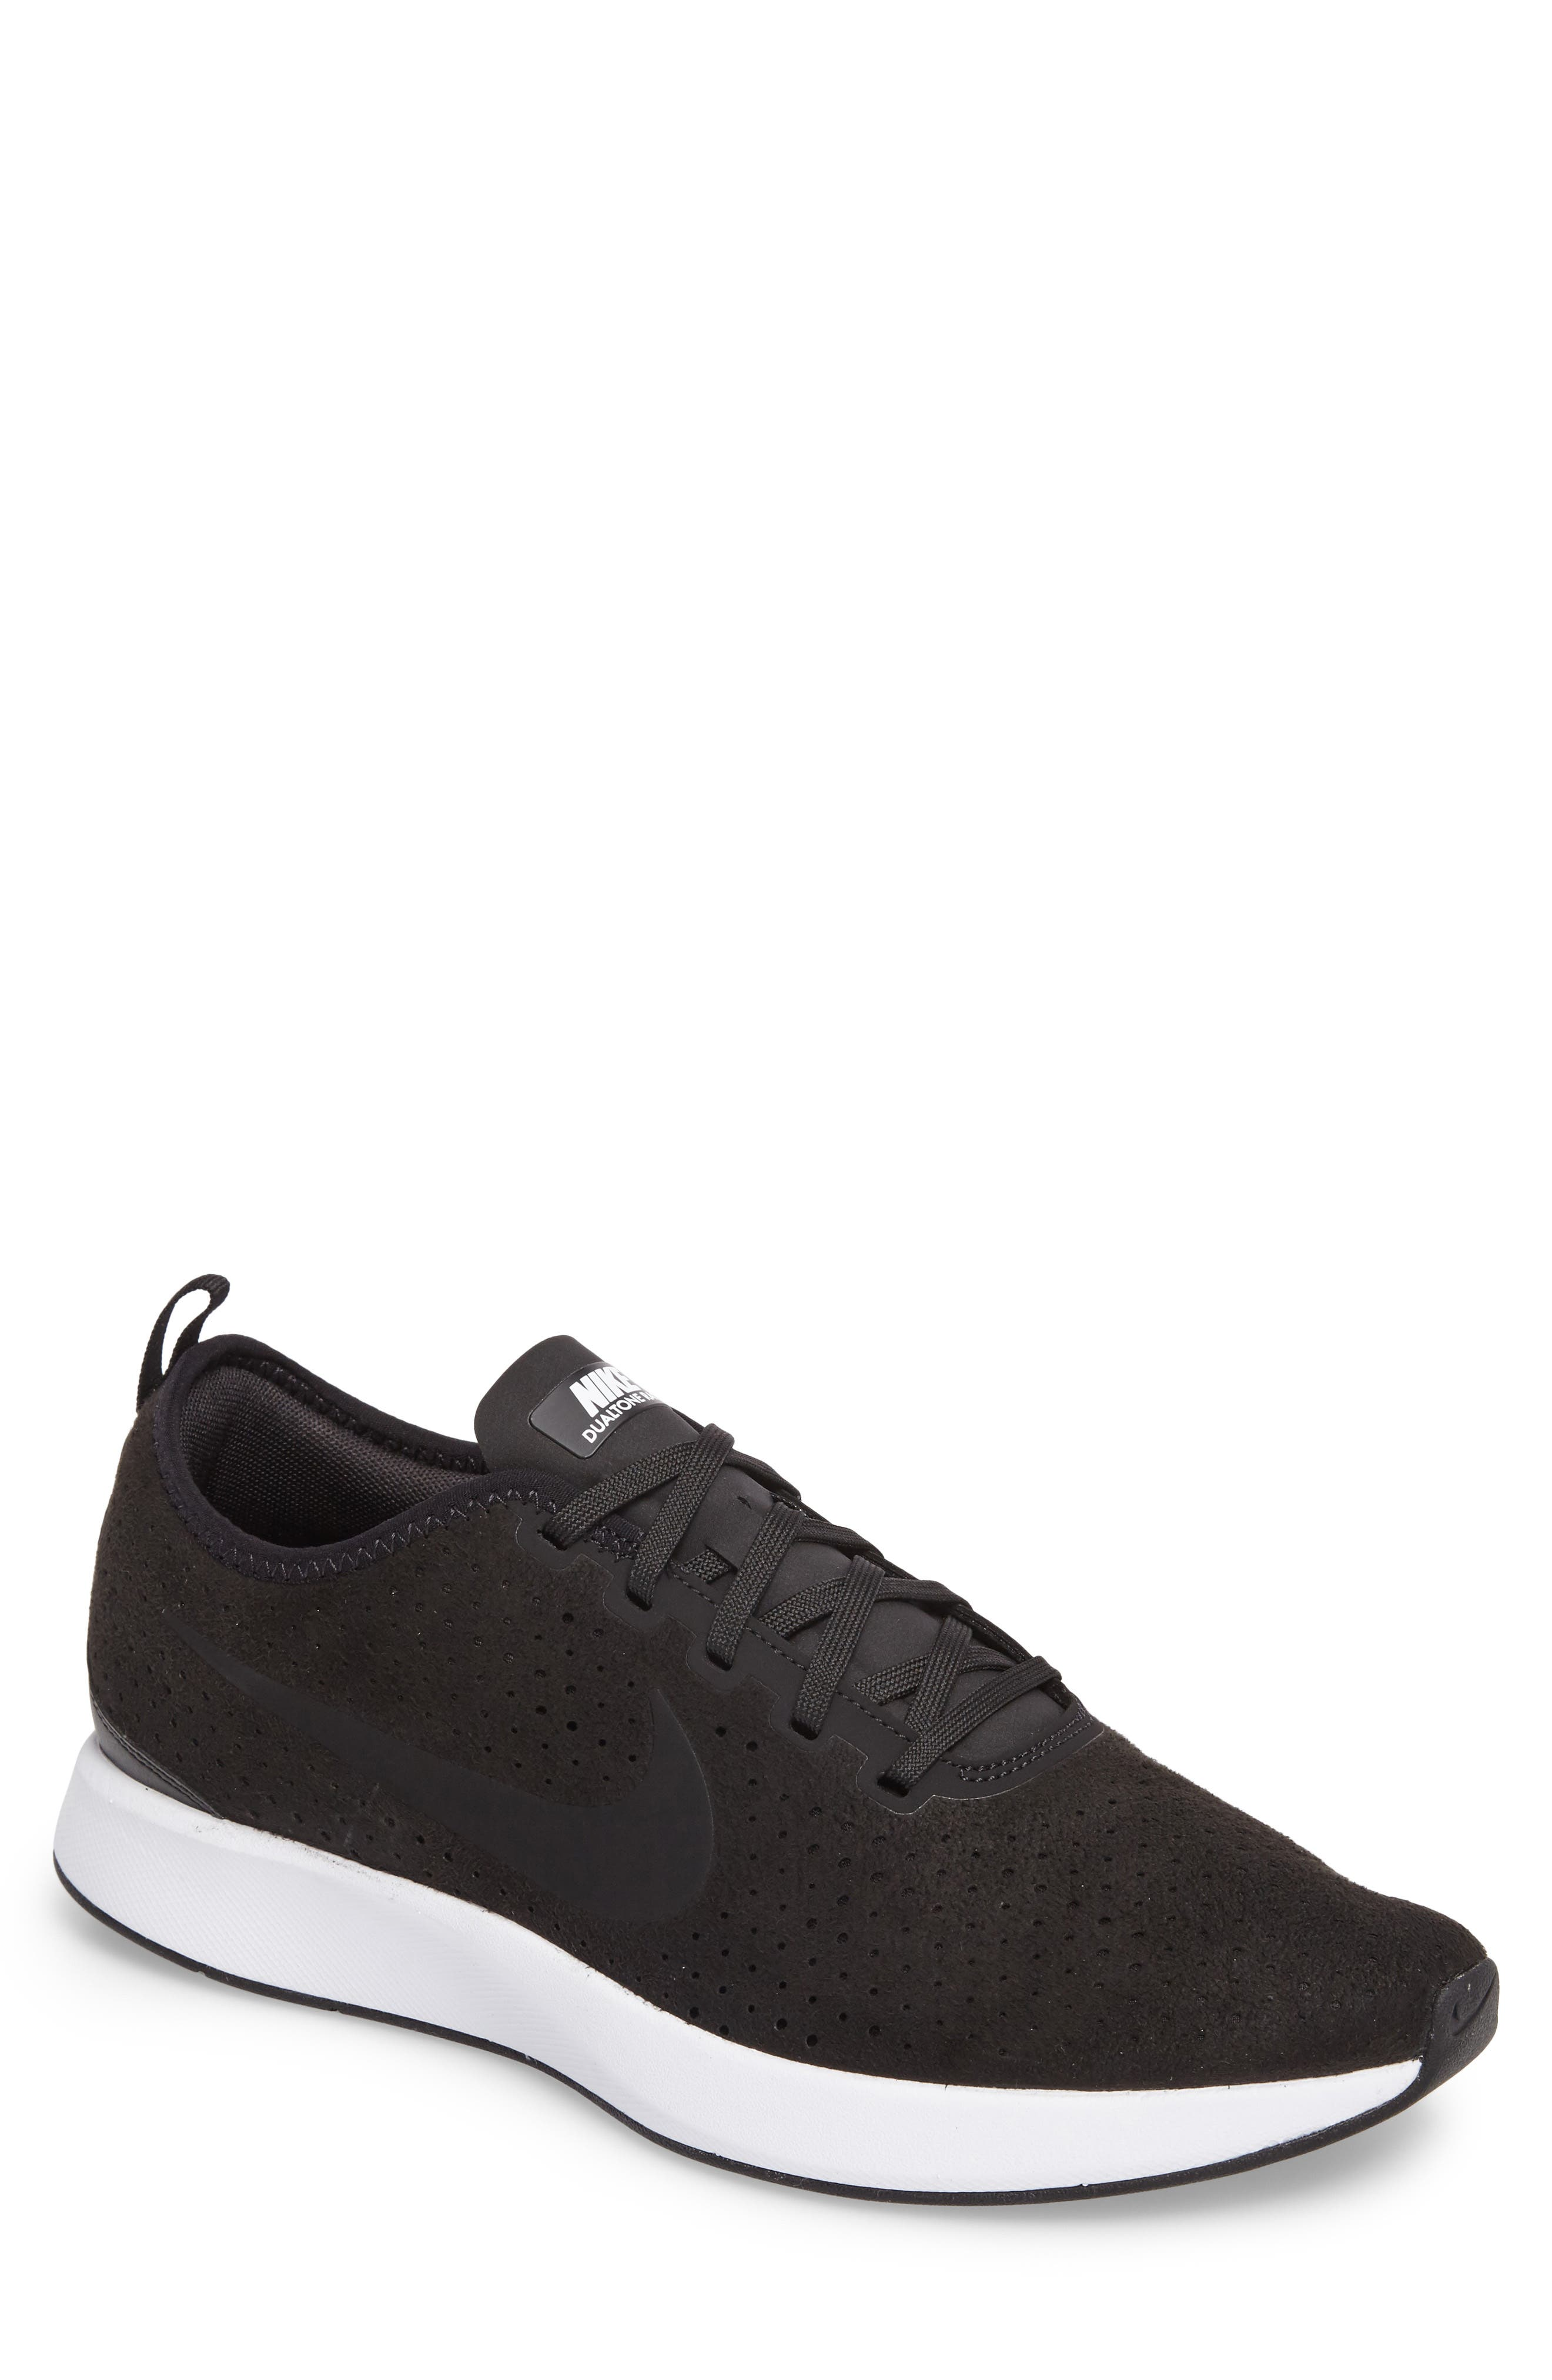 Dualtone Racer Premium Sneaker,                         Main,                         color, Black/Black/White